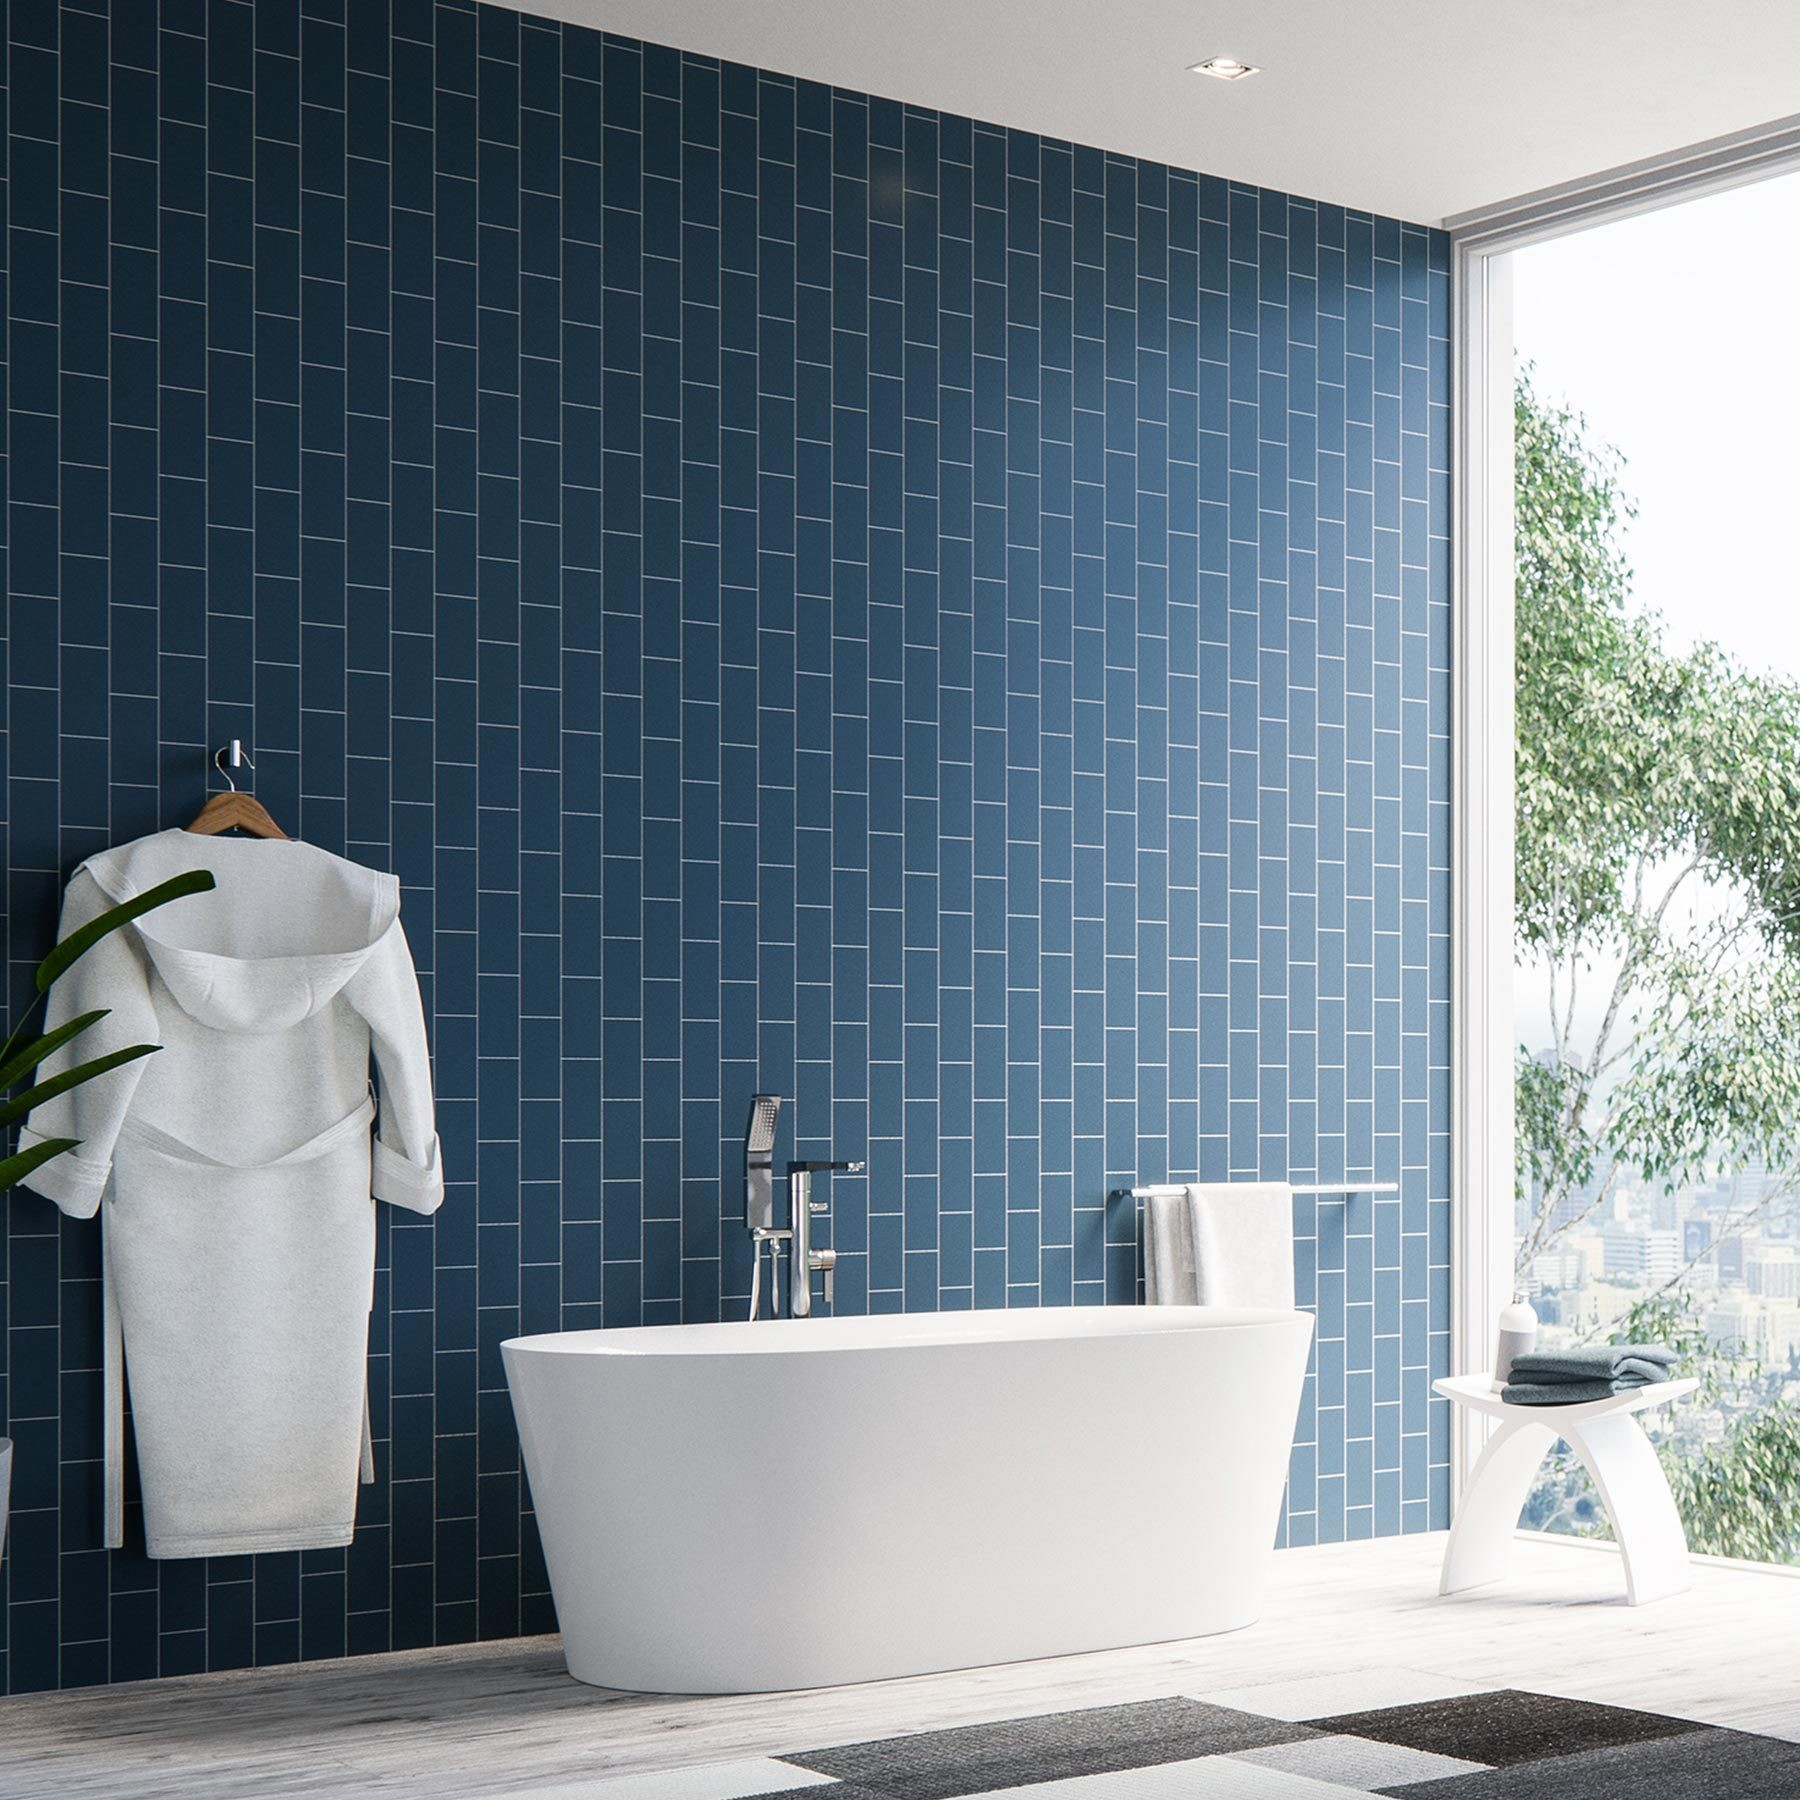 Attractive Resin Tubs Adornment - Bathtub Ideas - dilata.info